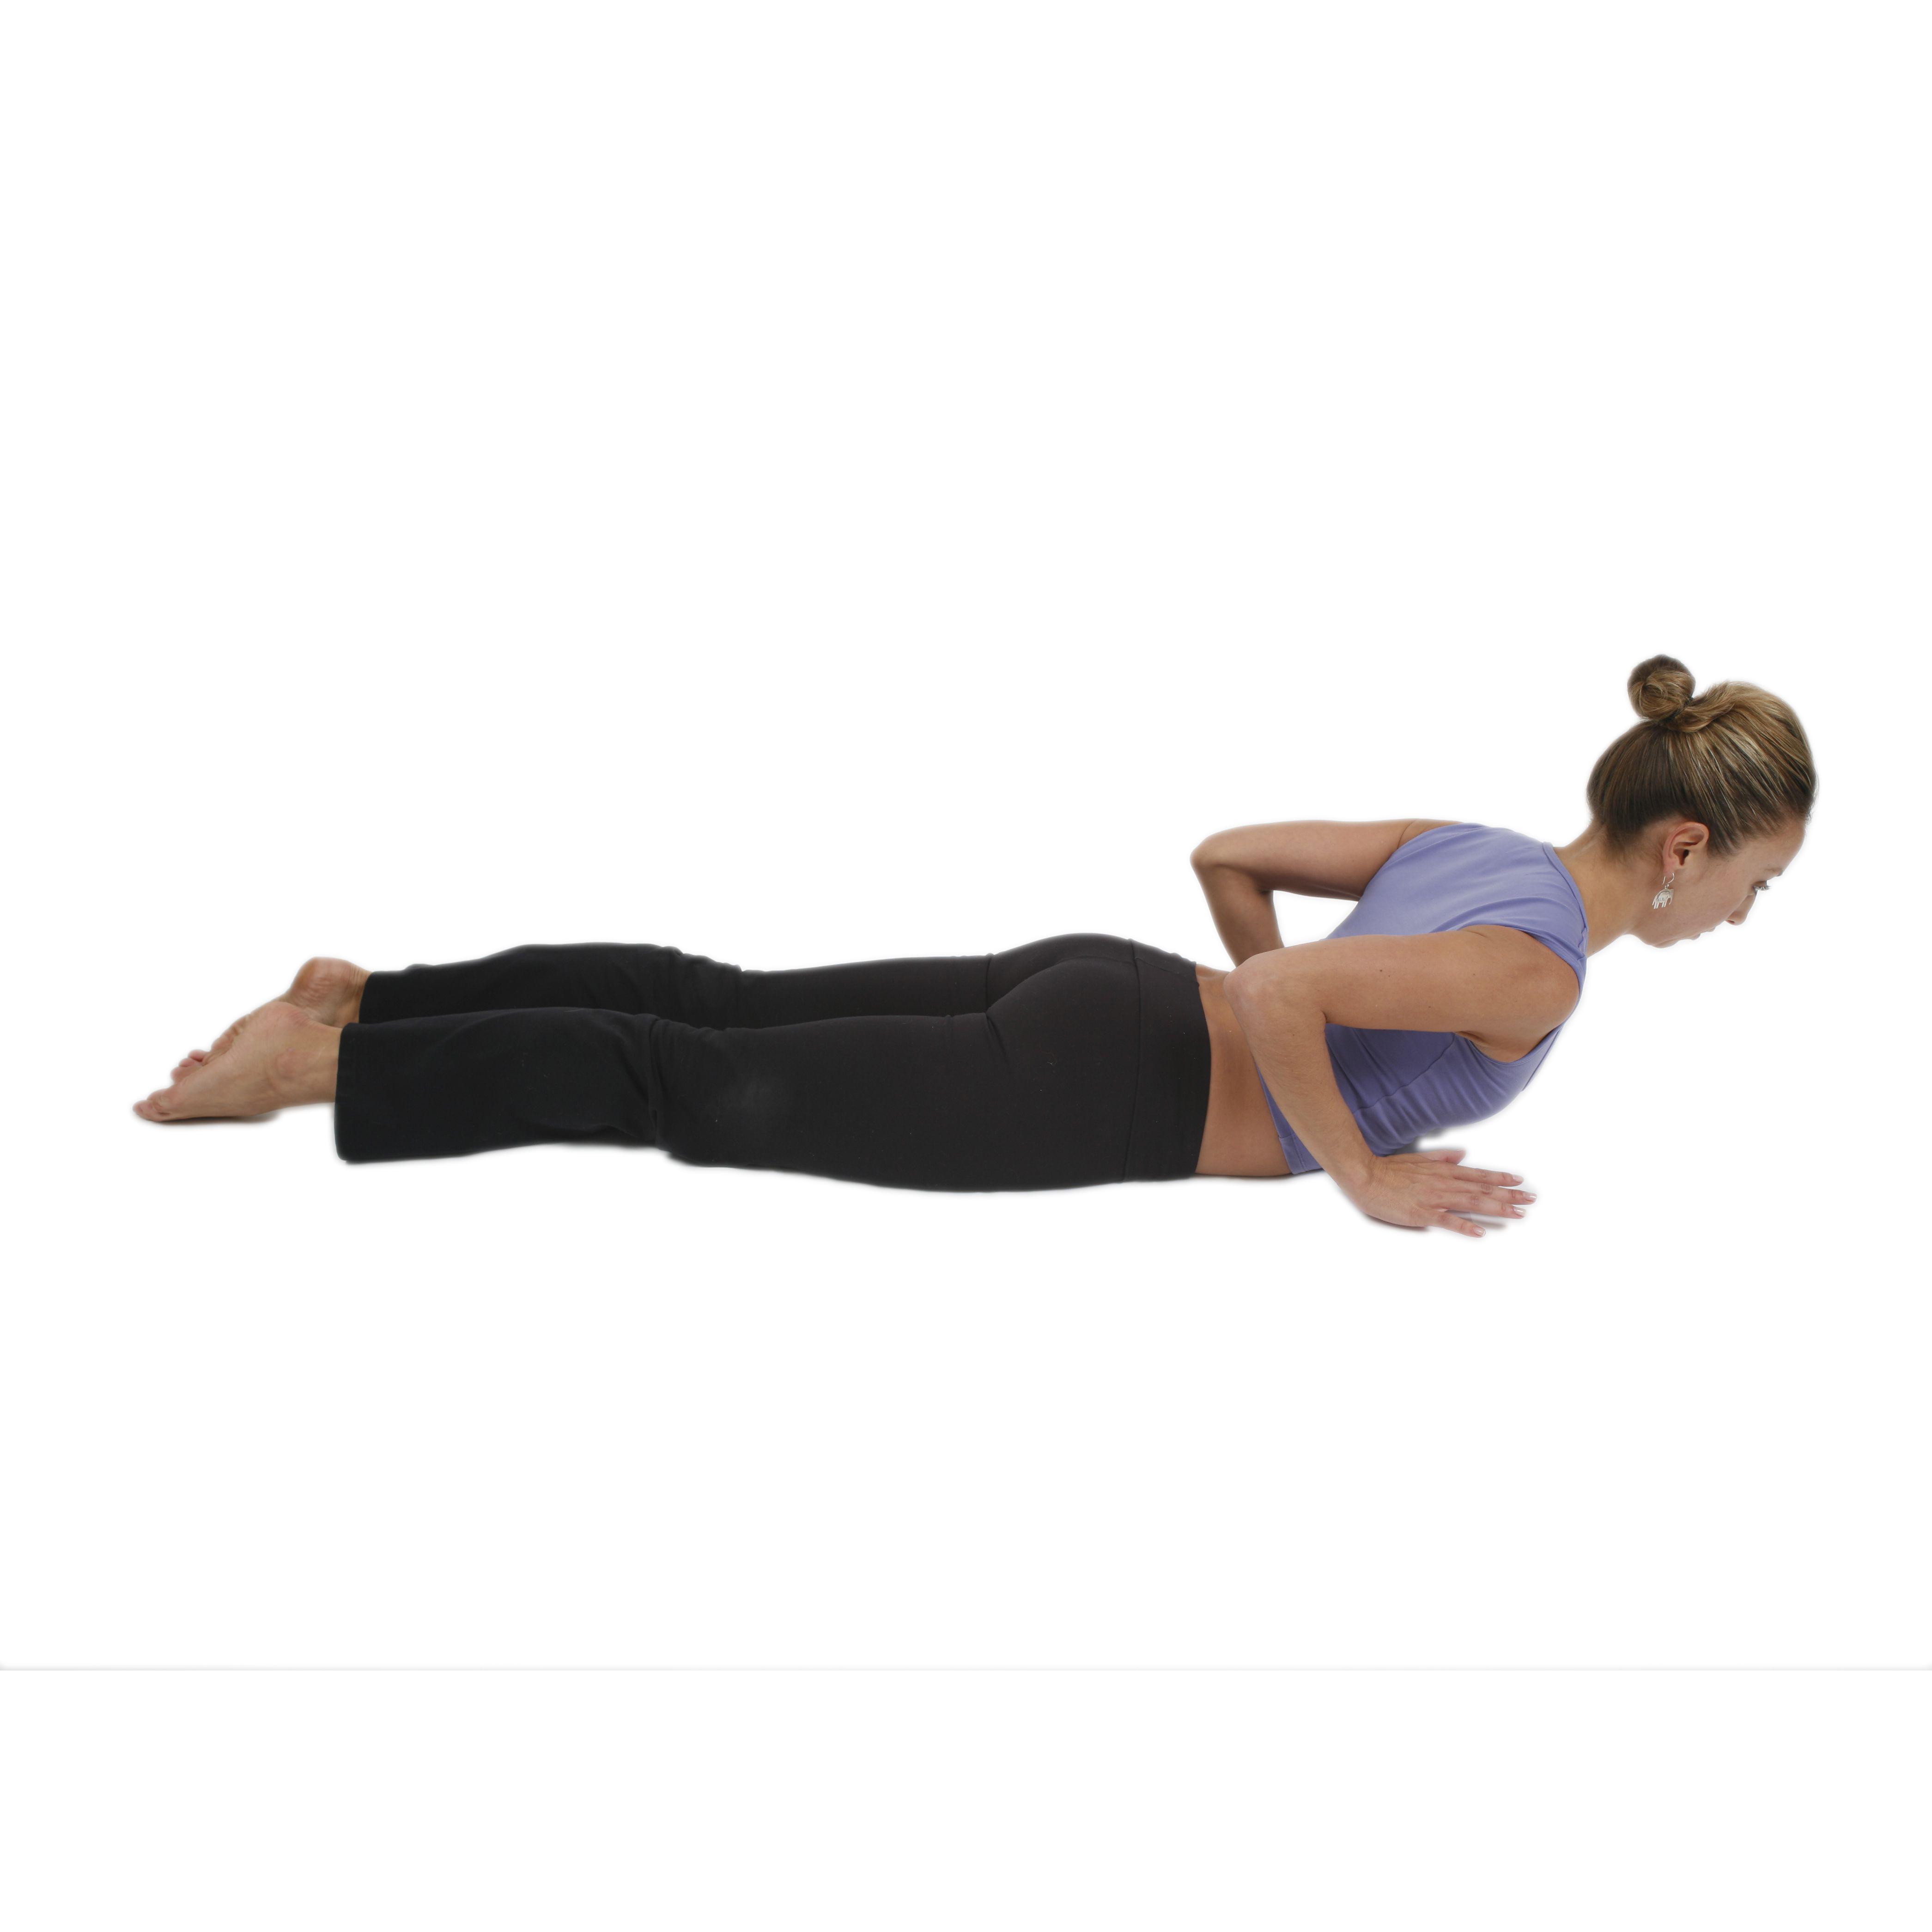 YogaDownload - Online Yoga Pose Guide